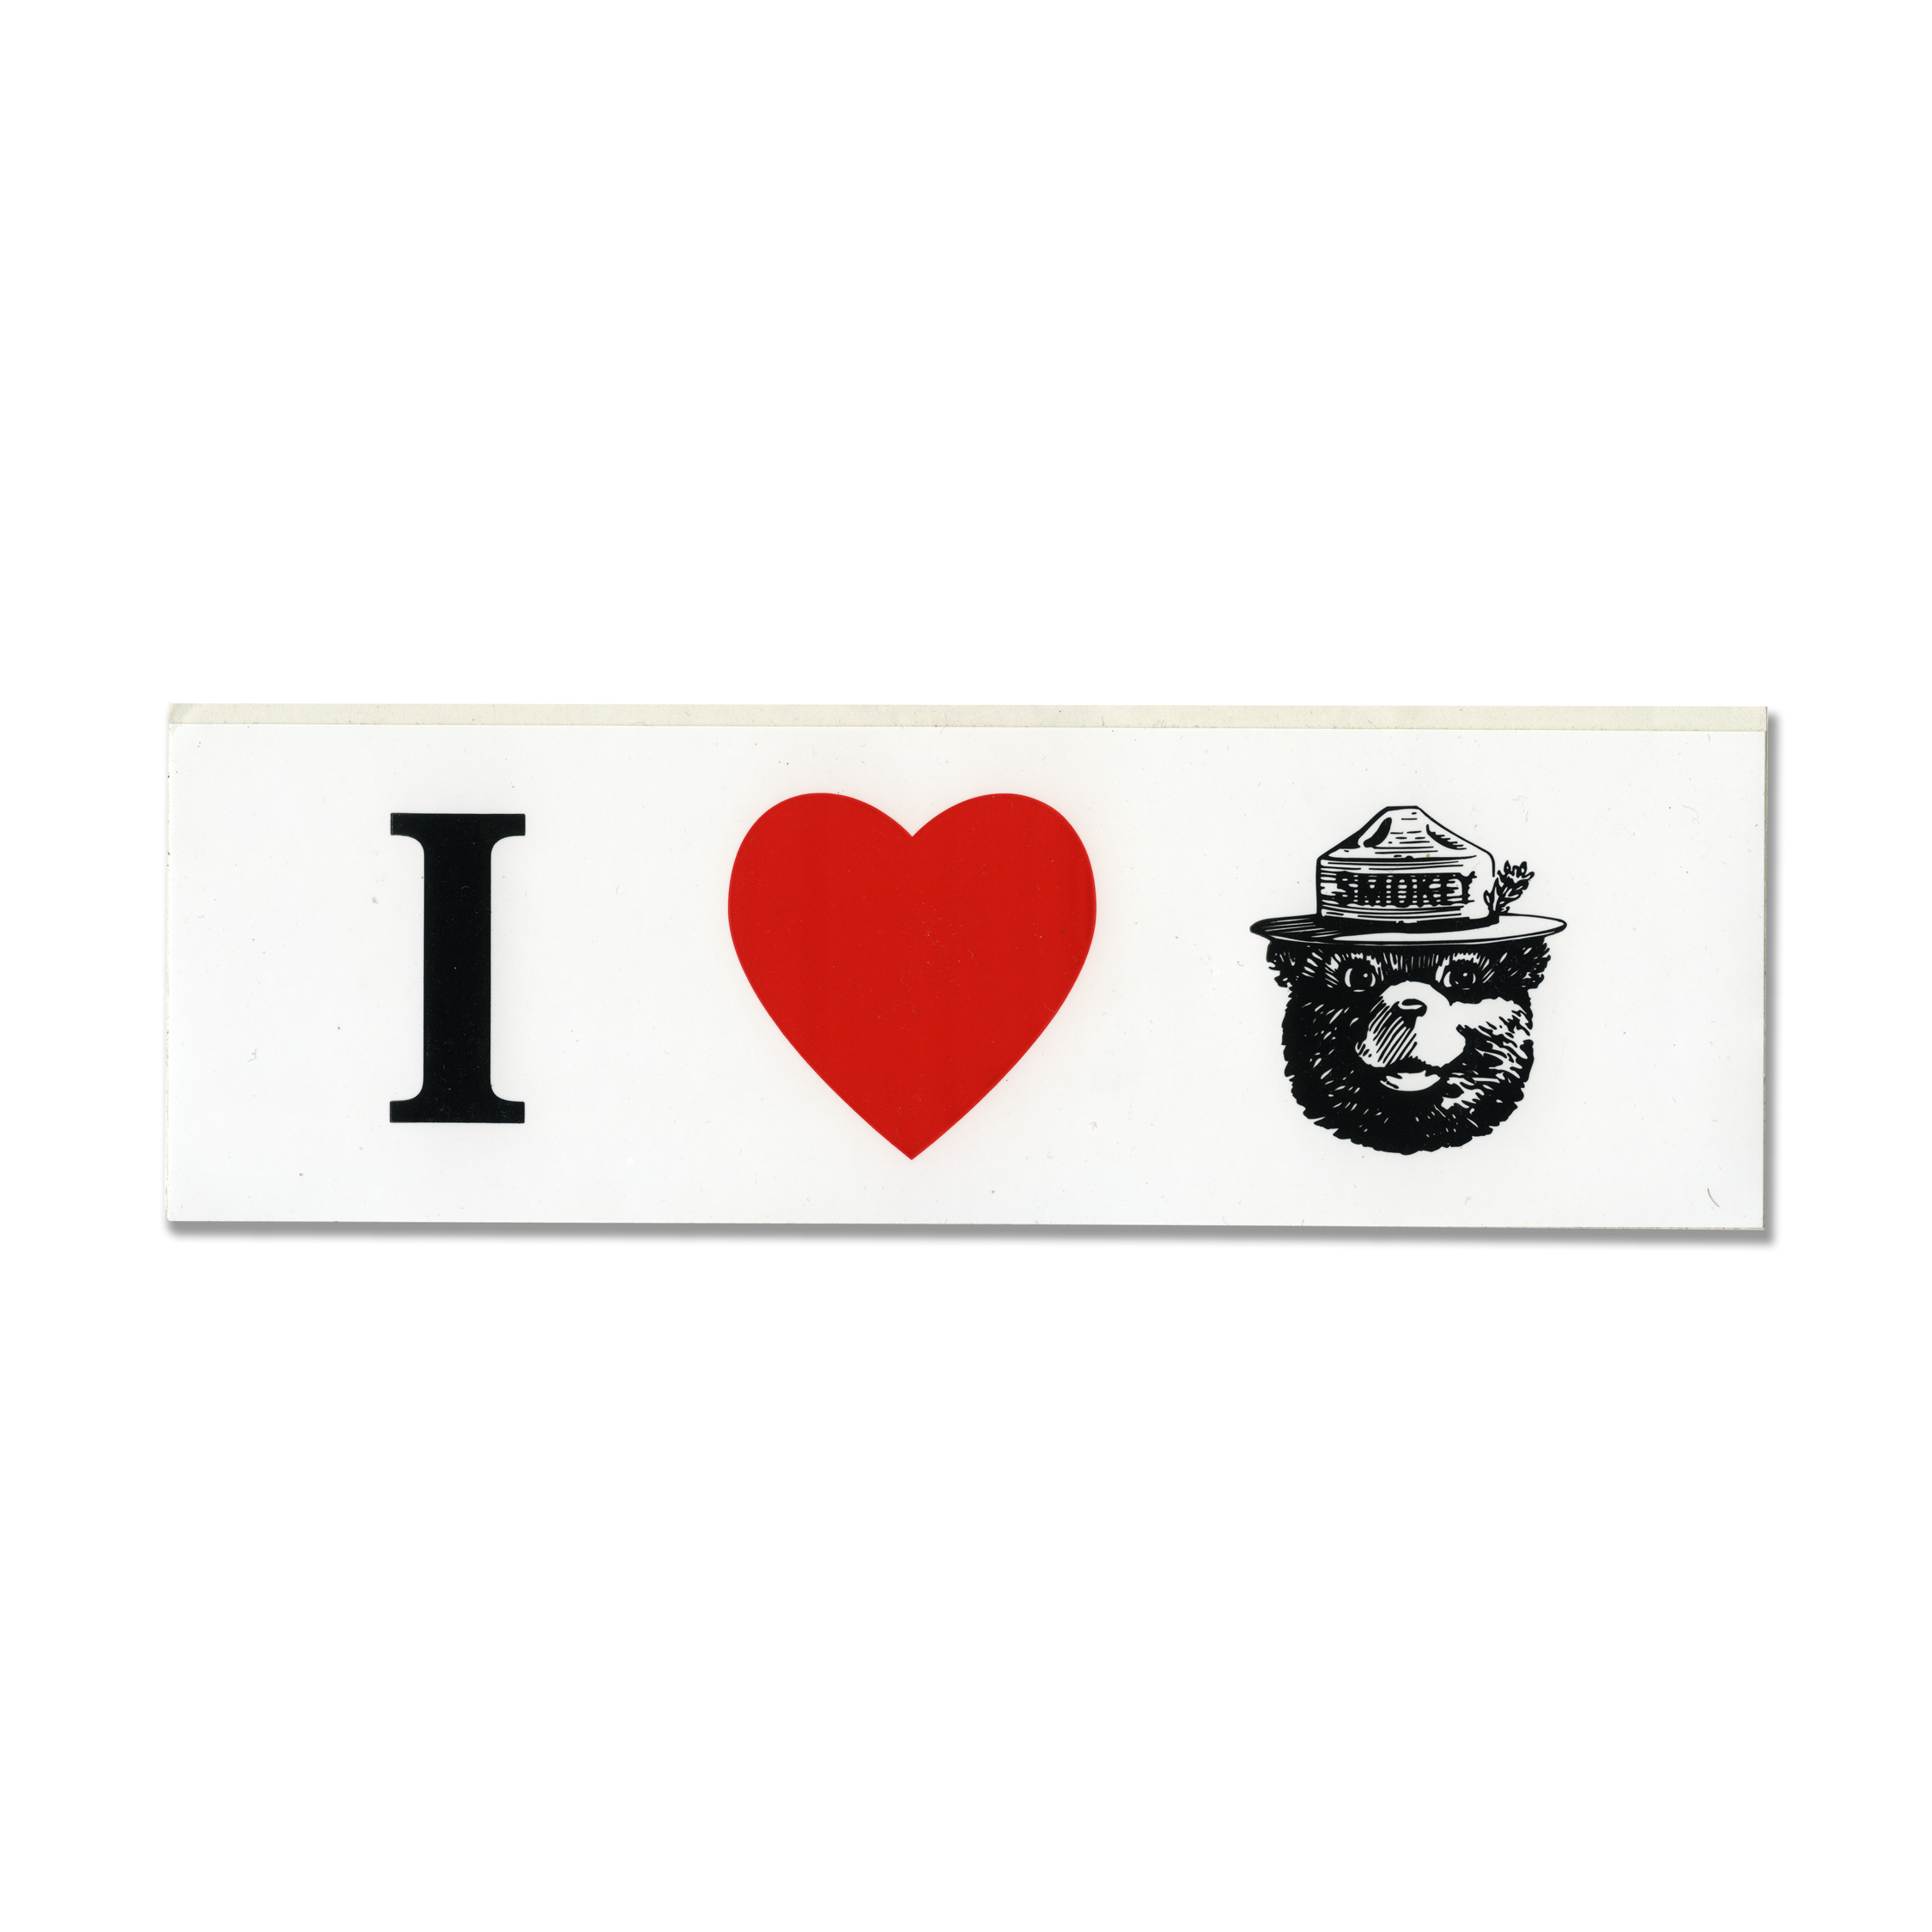 i_love_smokey_the_bear_lbumper_sticker.jpg